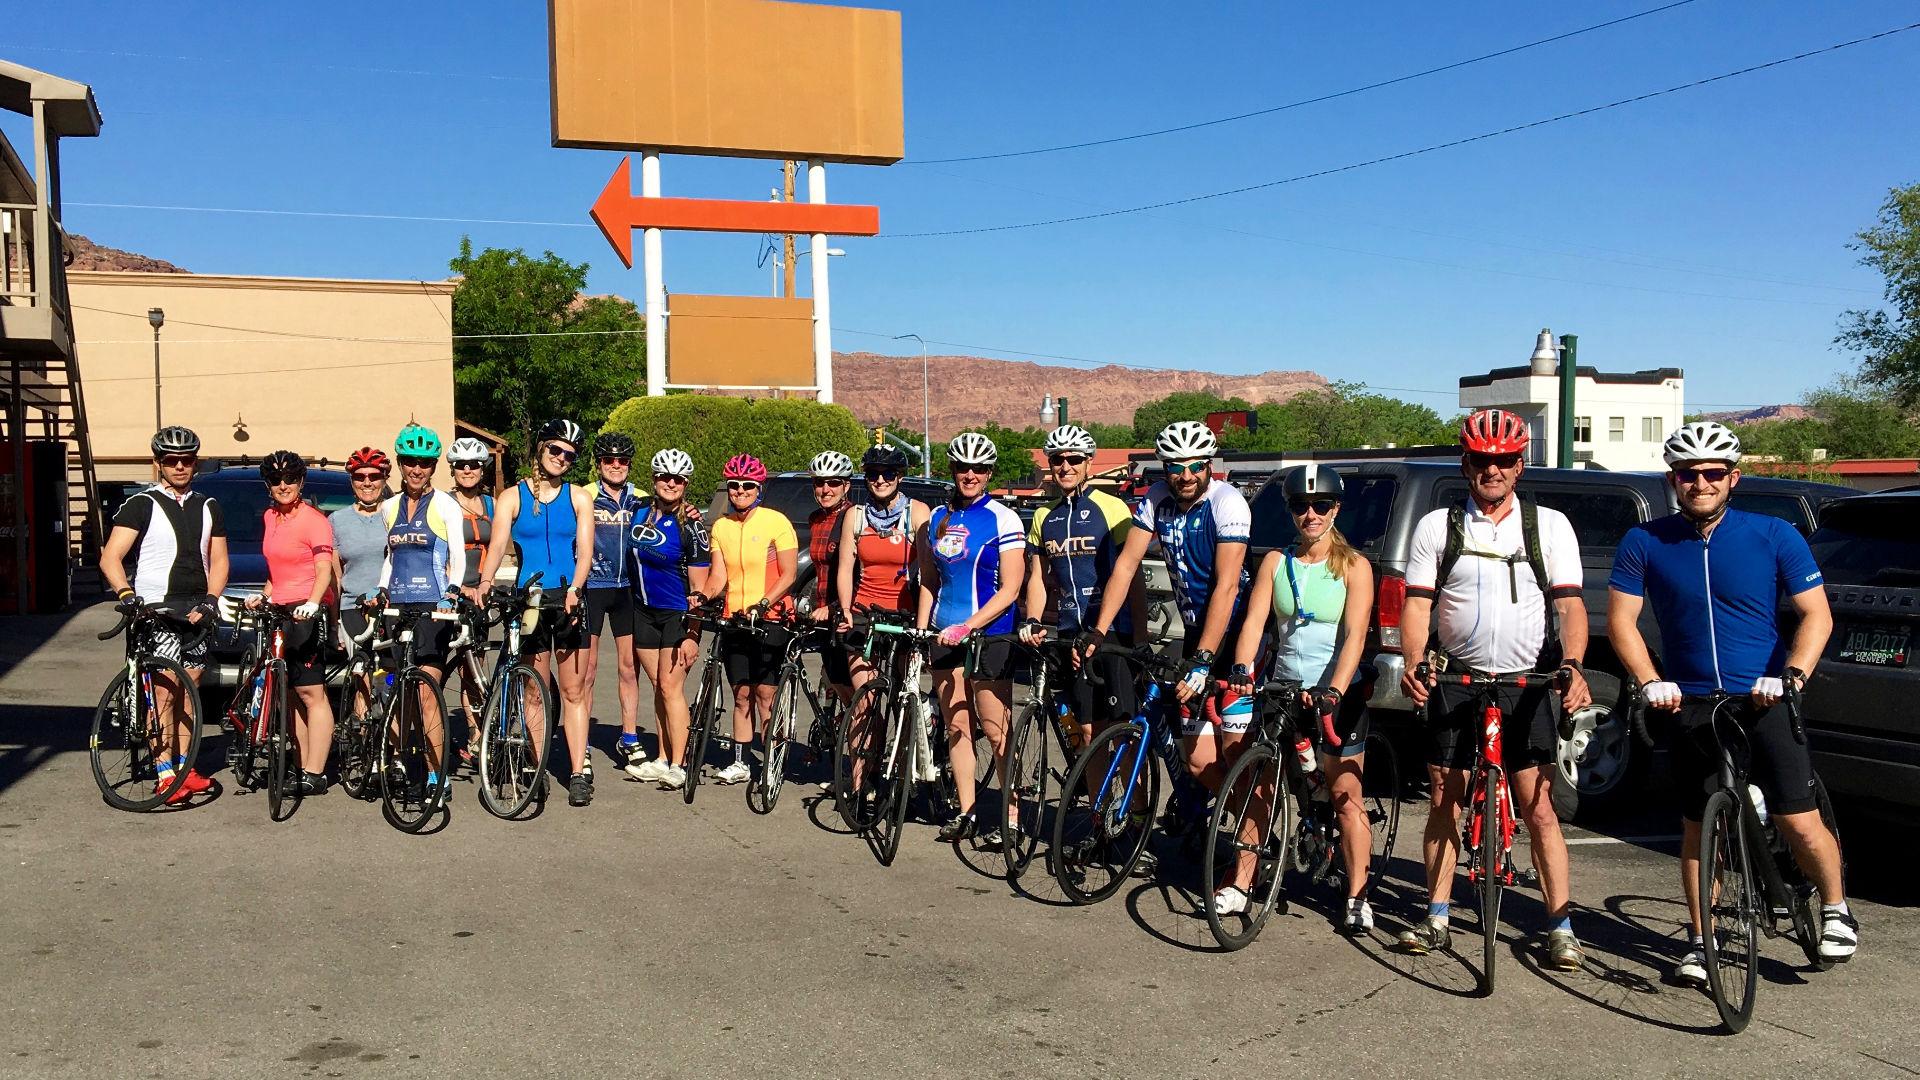 RMTC Members Posing on Bikes